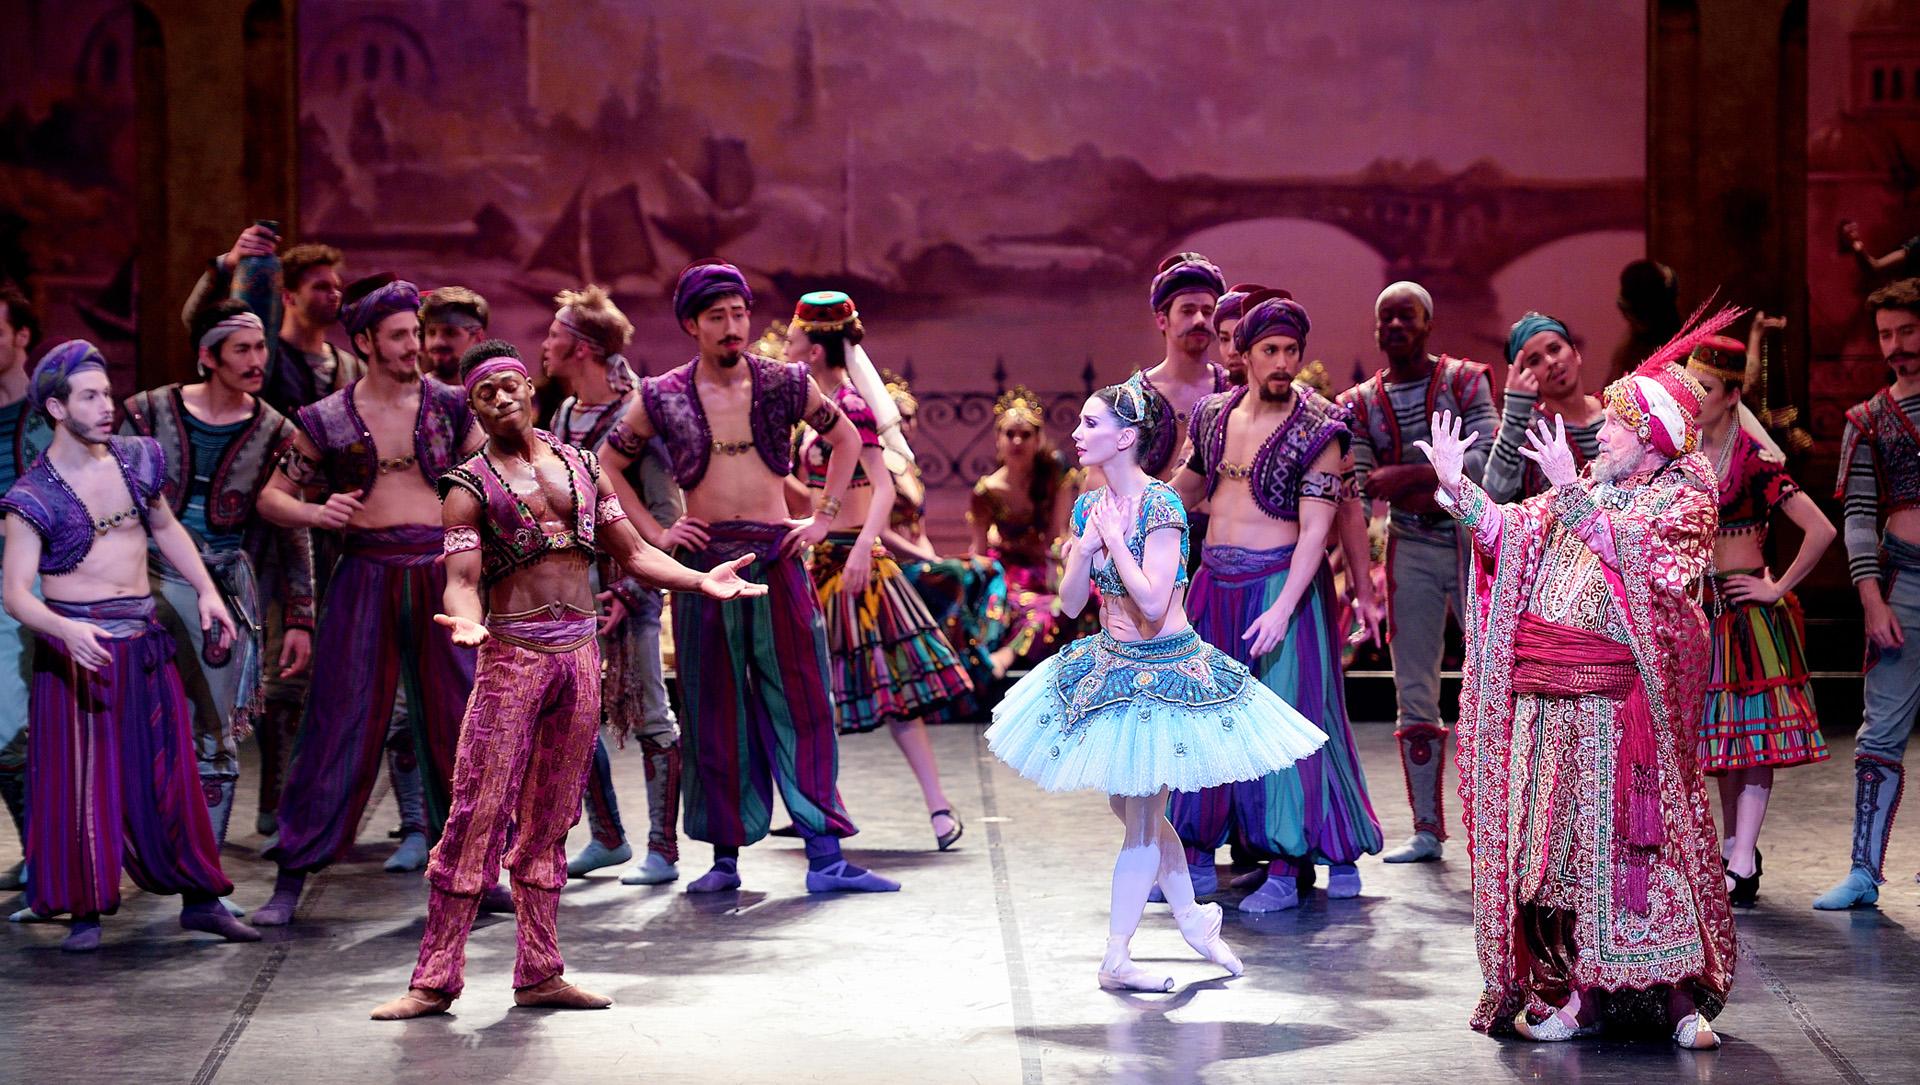 English National Ballet. Tamara Rojo dancing in English National Ballet's 'Le Corsaire'.